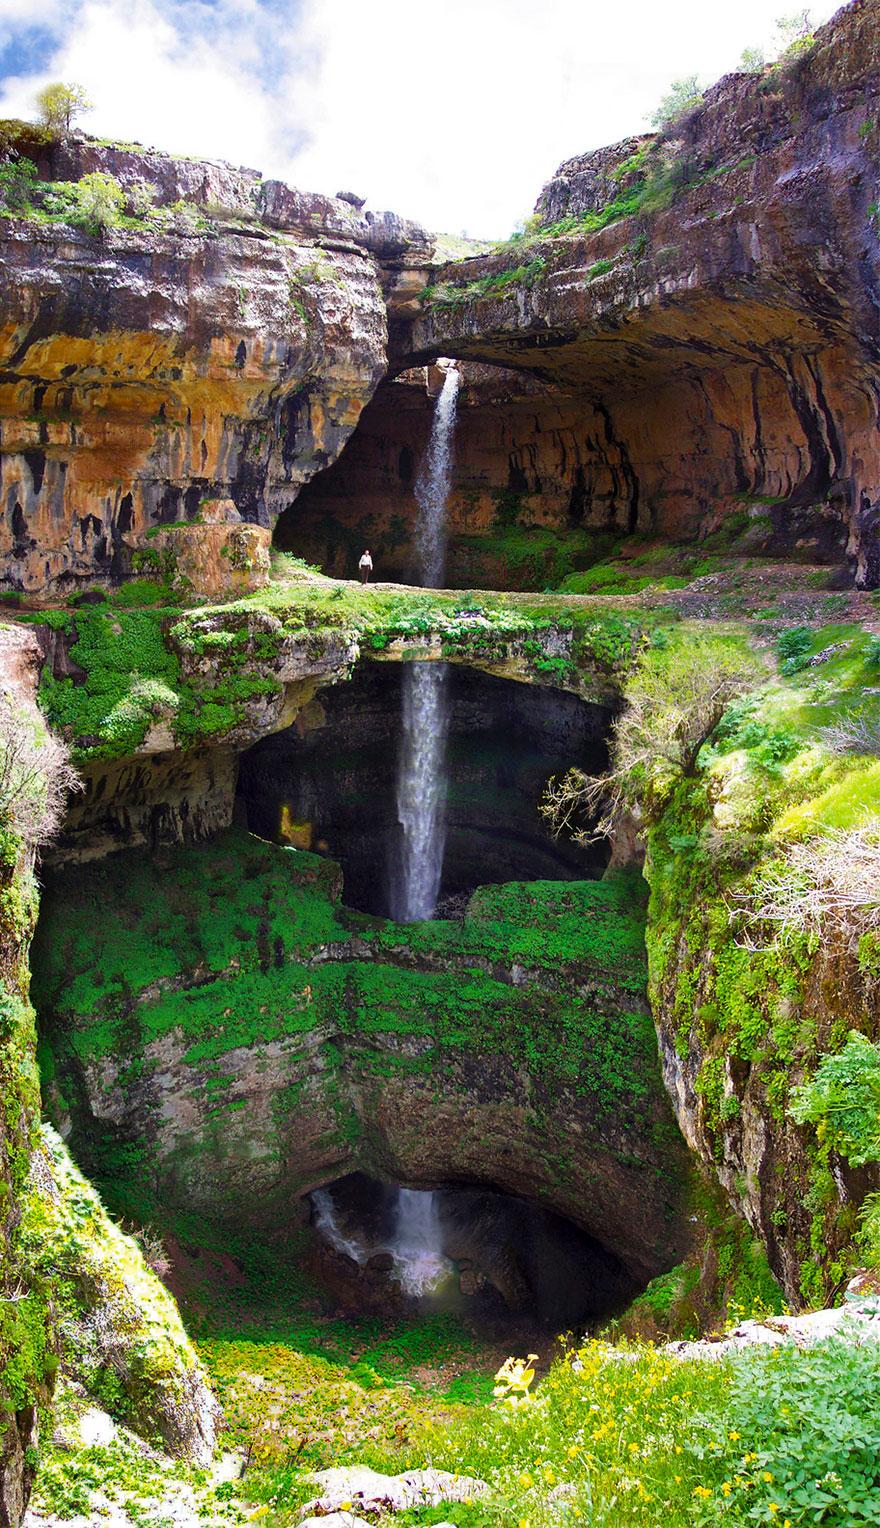 three-bridges-cave-baatara-gorge-waterfall-lebanon-13